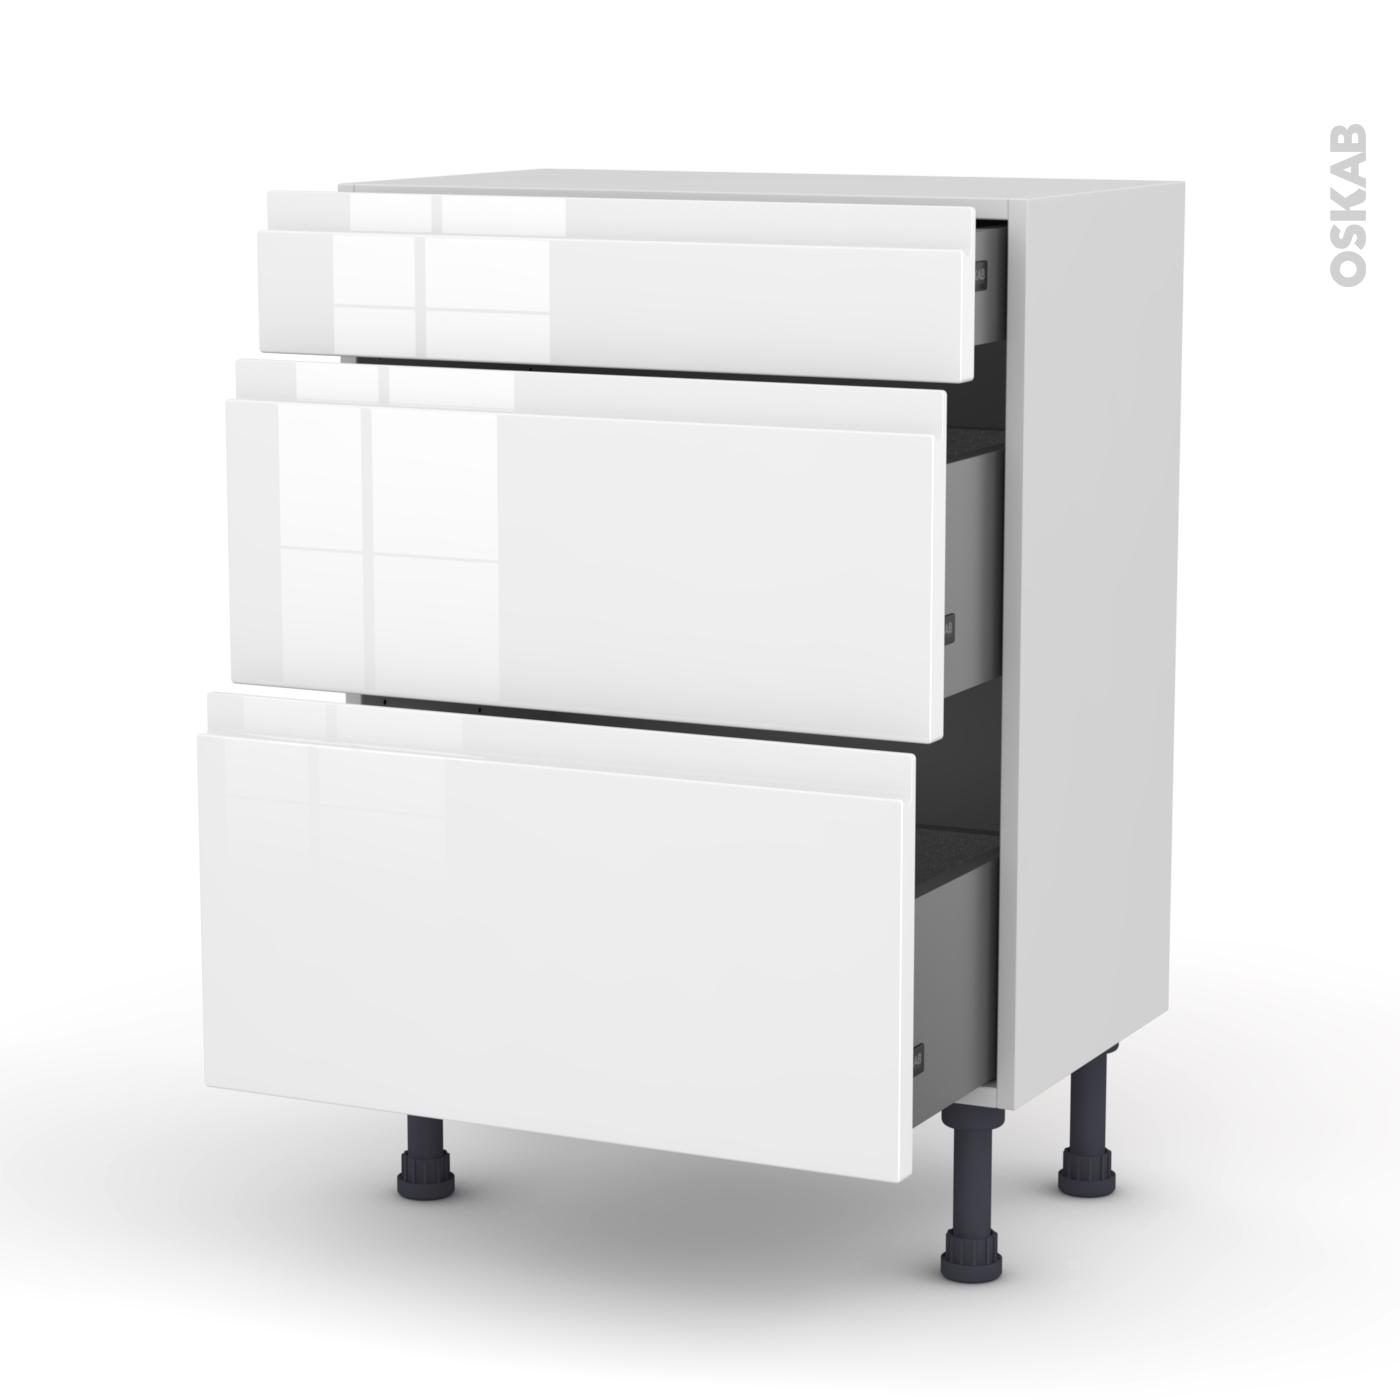 Meuble de cuisine Bas IPOMA Blanc brillant, 10 tiroirs, L10 x H10 x P107 cm